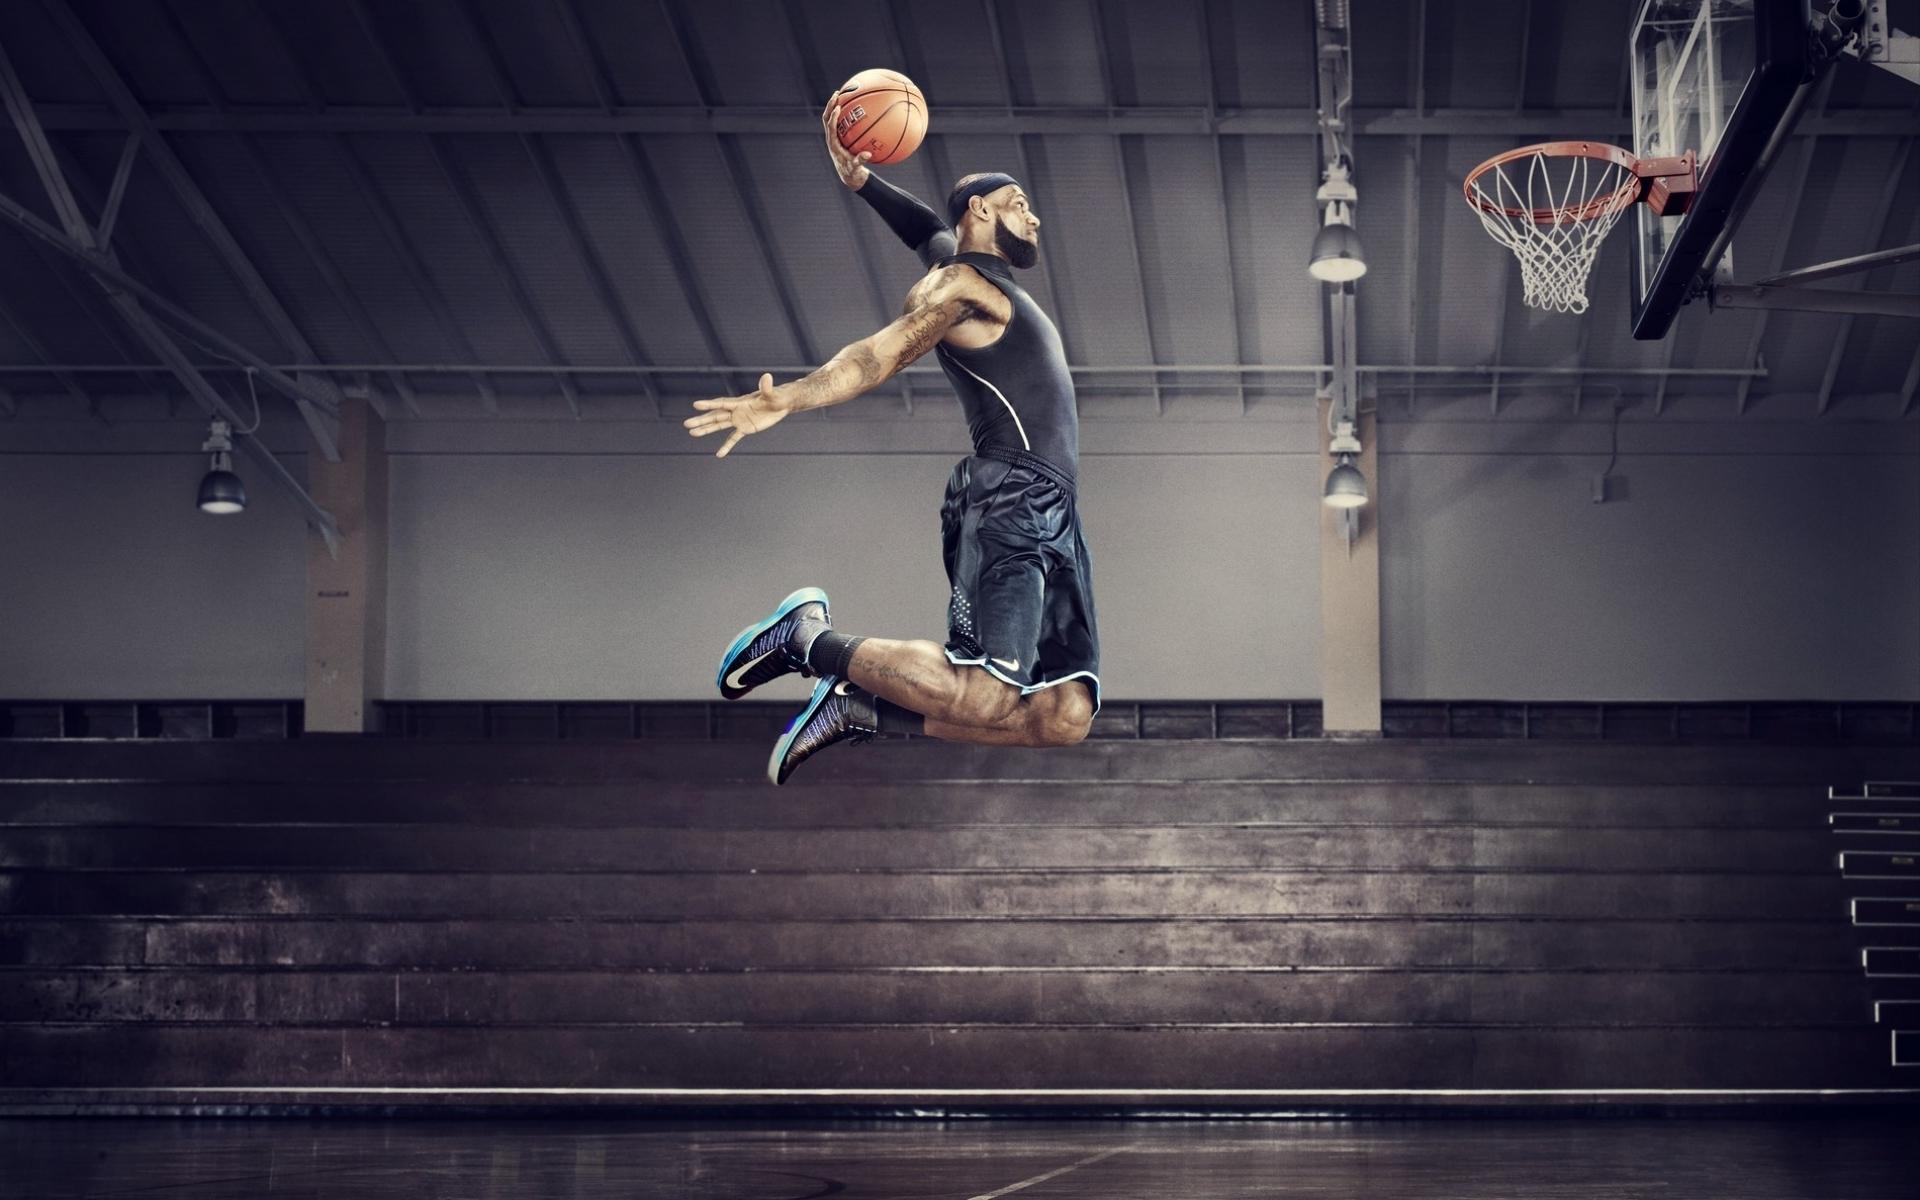 Hi84 Lebron James Nba Basketball Dunk Wallpaper: LeBron James Slam Dunk Wallpaper